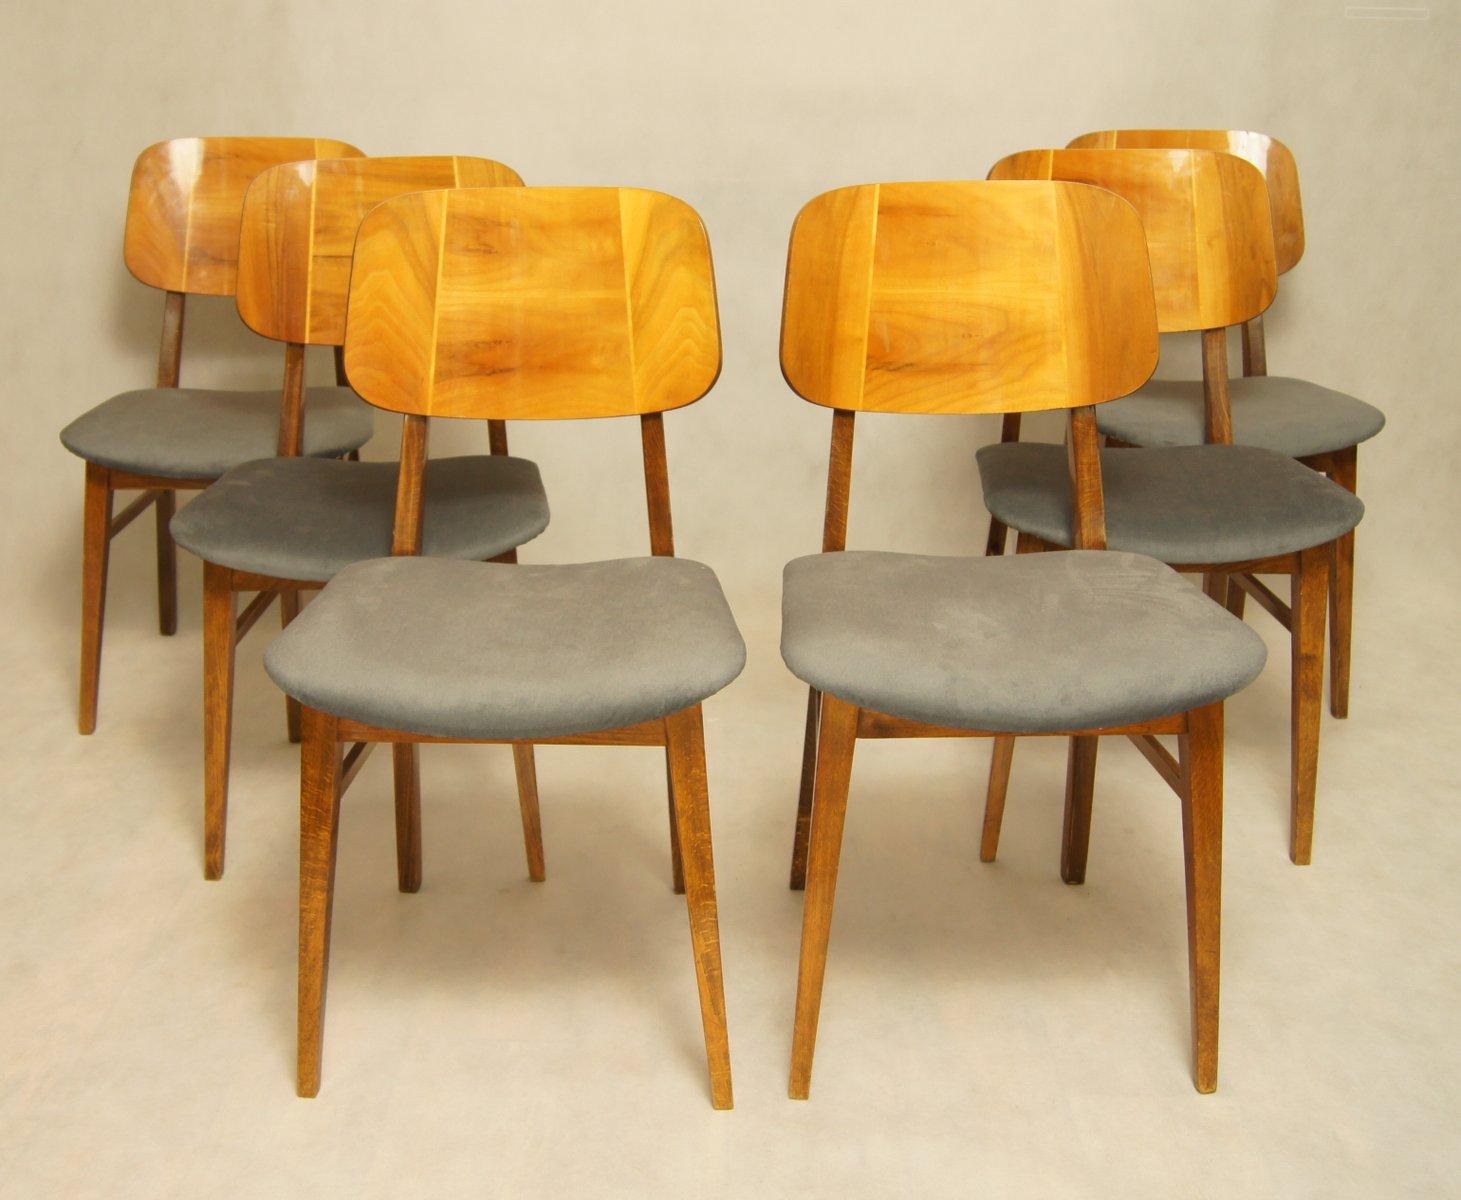 rum nische bilea st hle 1960er 6er set bei pamono kaufen. Black Bedroom Furniture Sets. Home Design Ideas